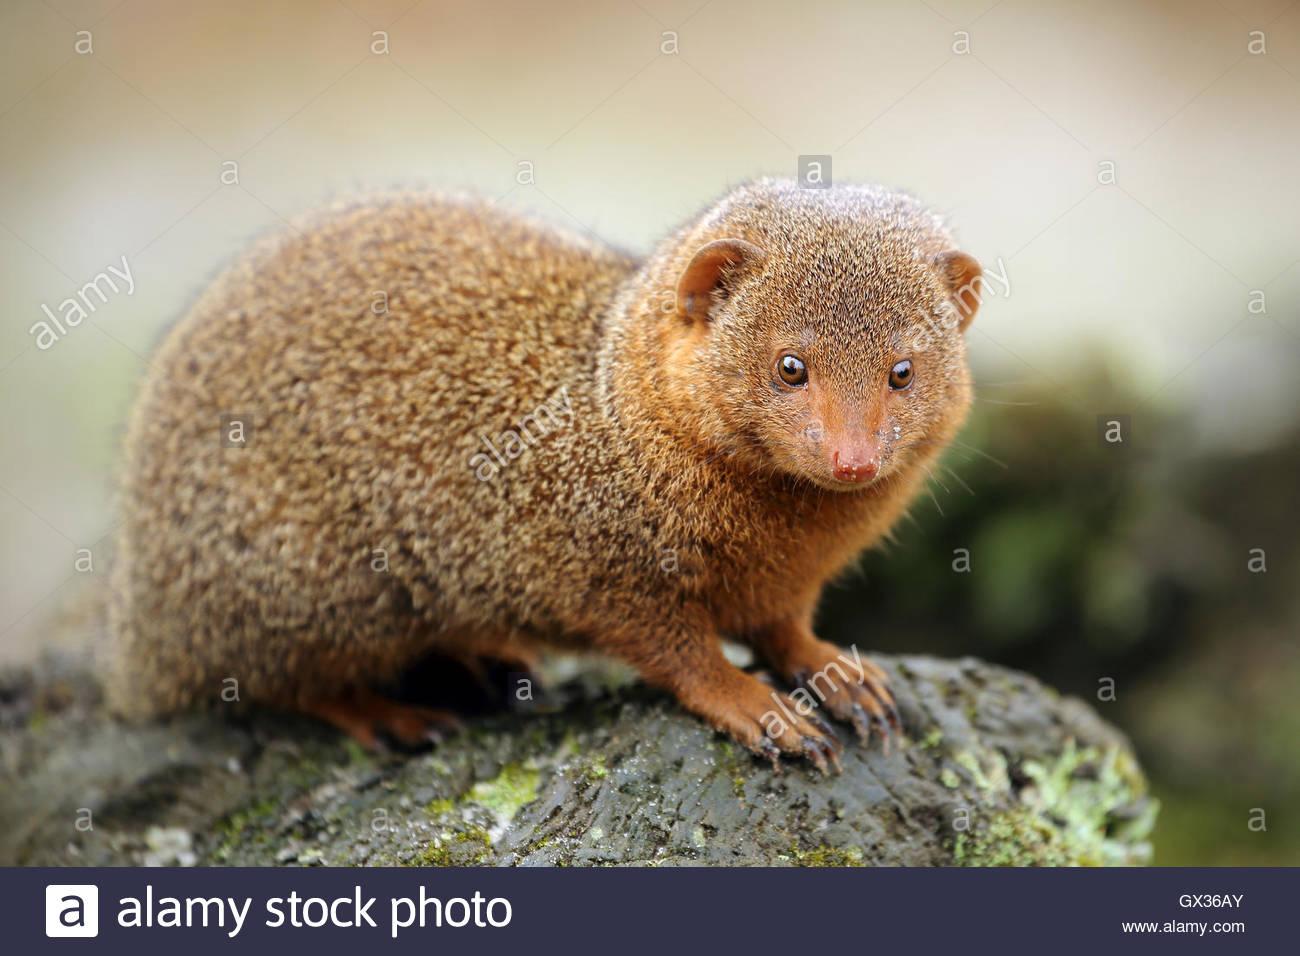 Pygmy Mongoose sitting on a rock. - Stock Image